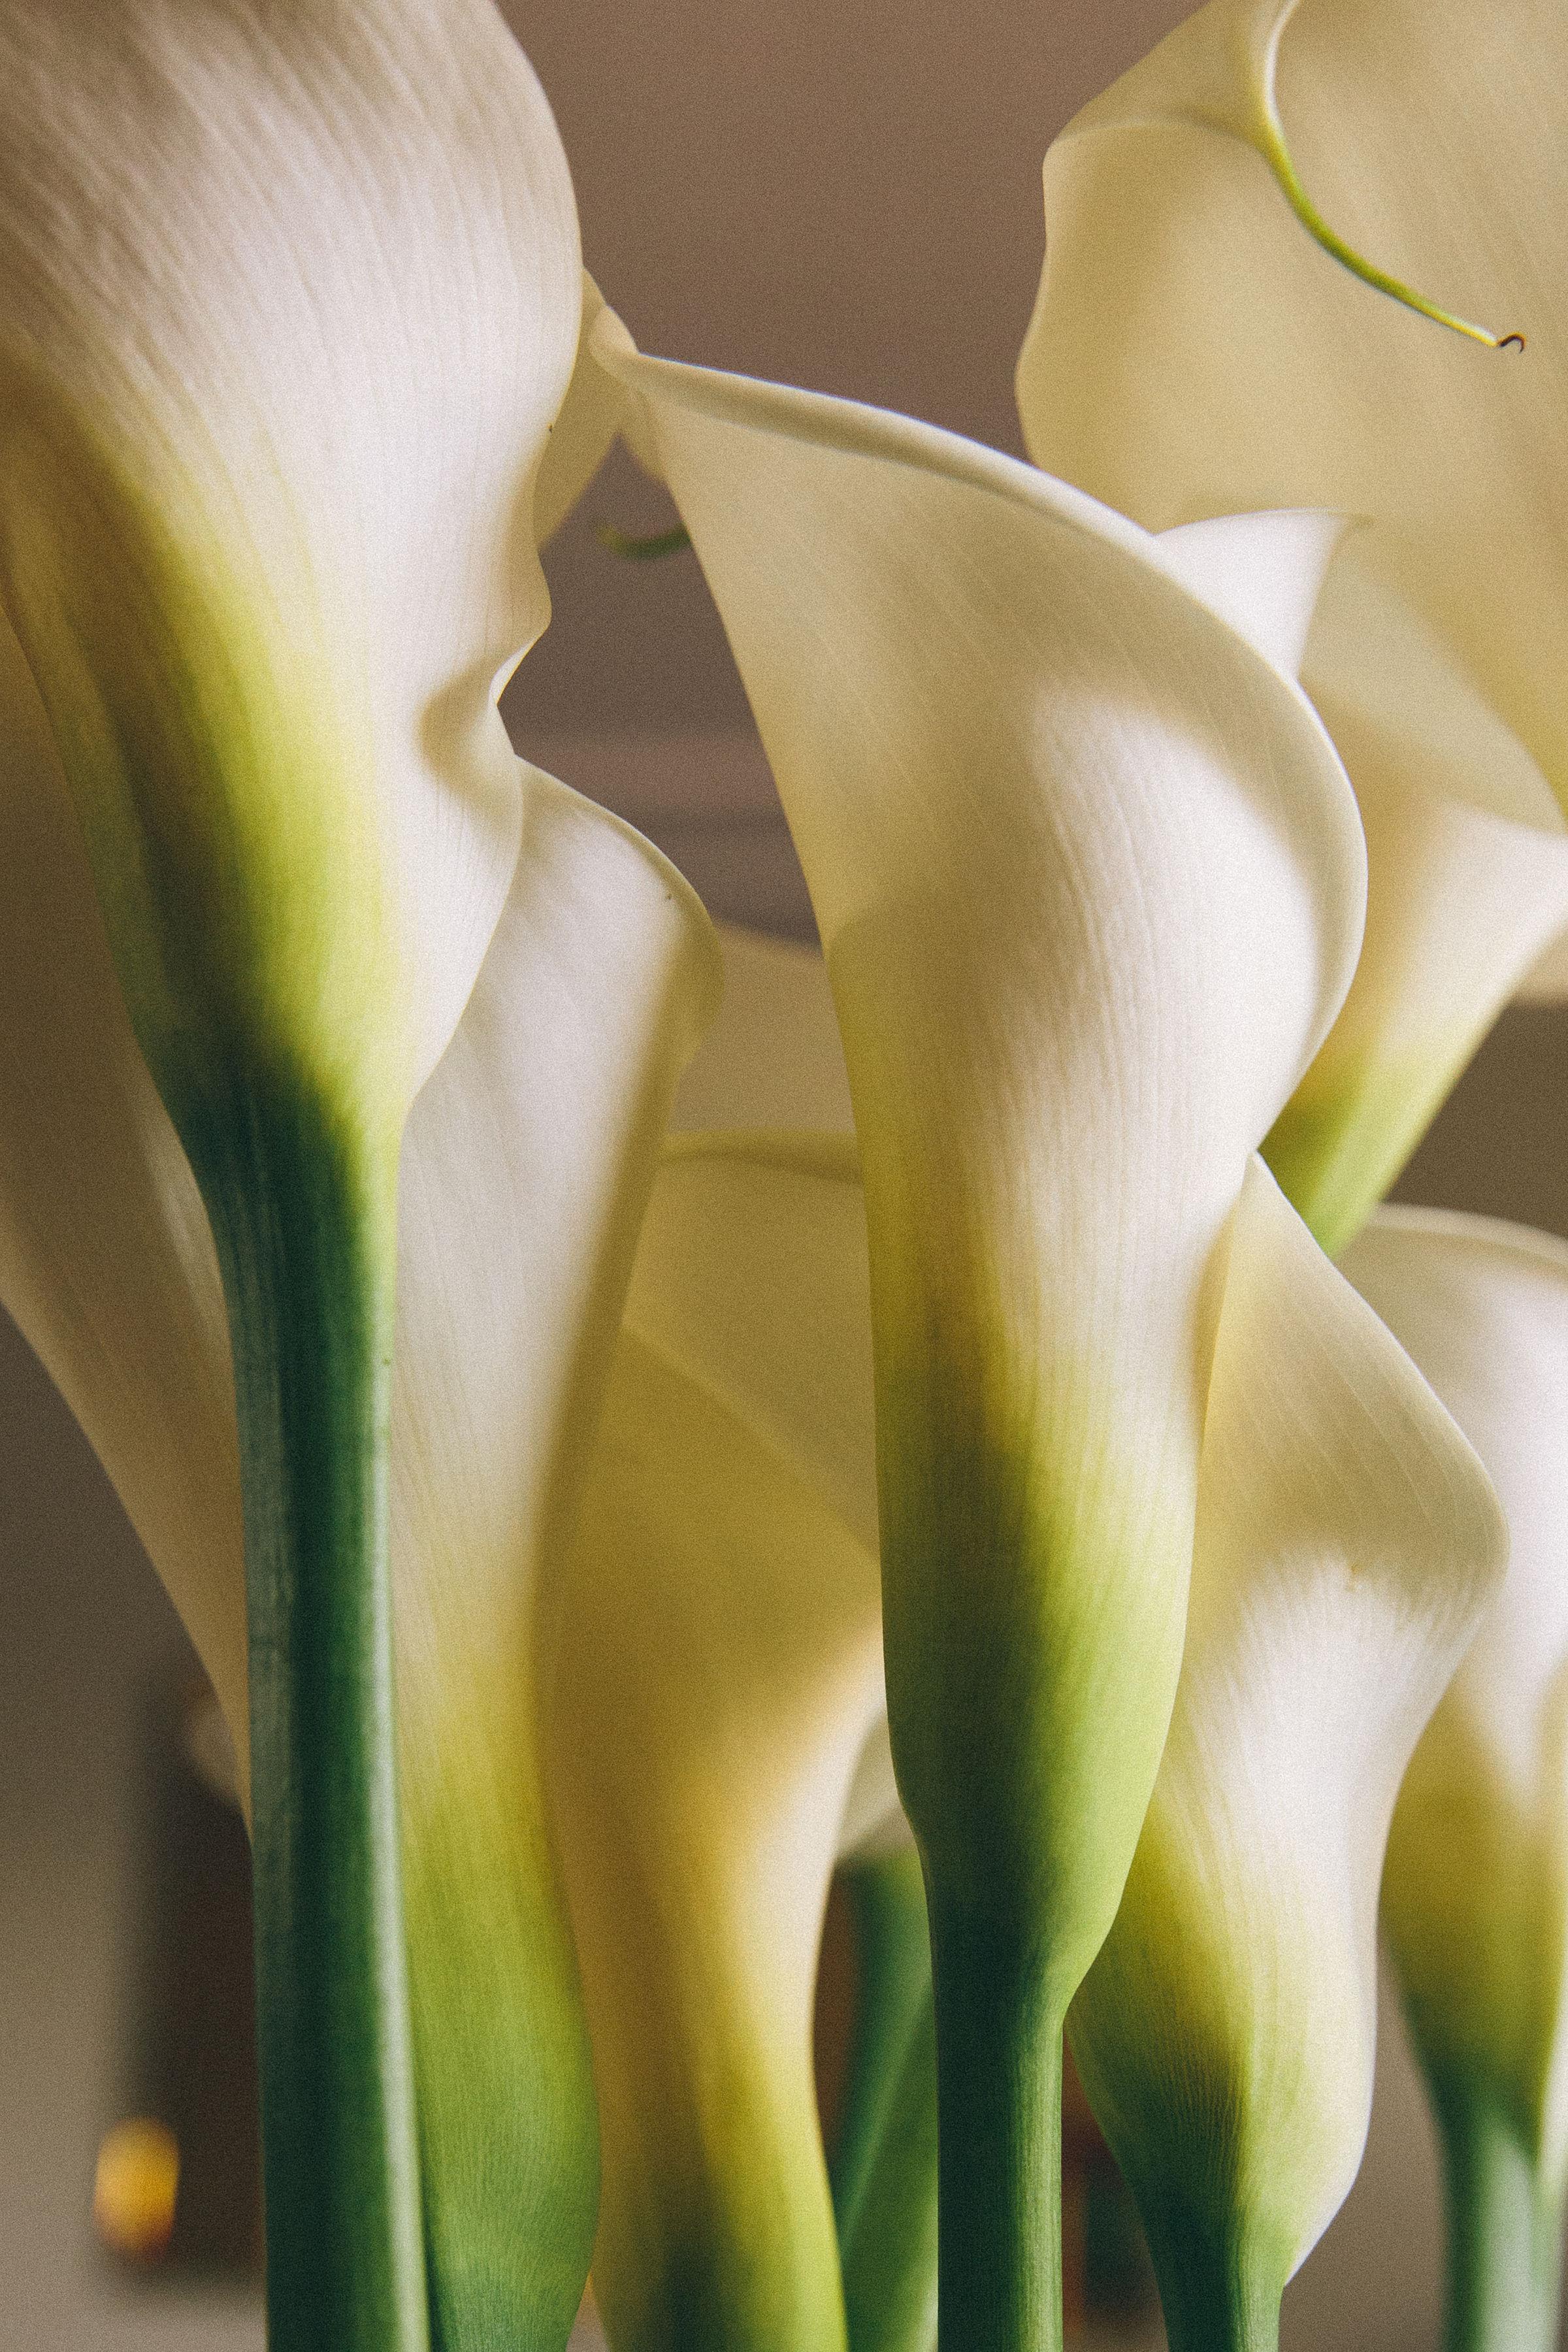 ellice ruiz_sustainable workwear_calla lillies.jpg